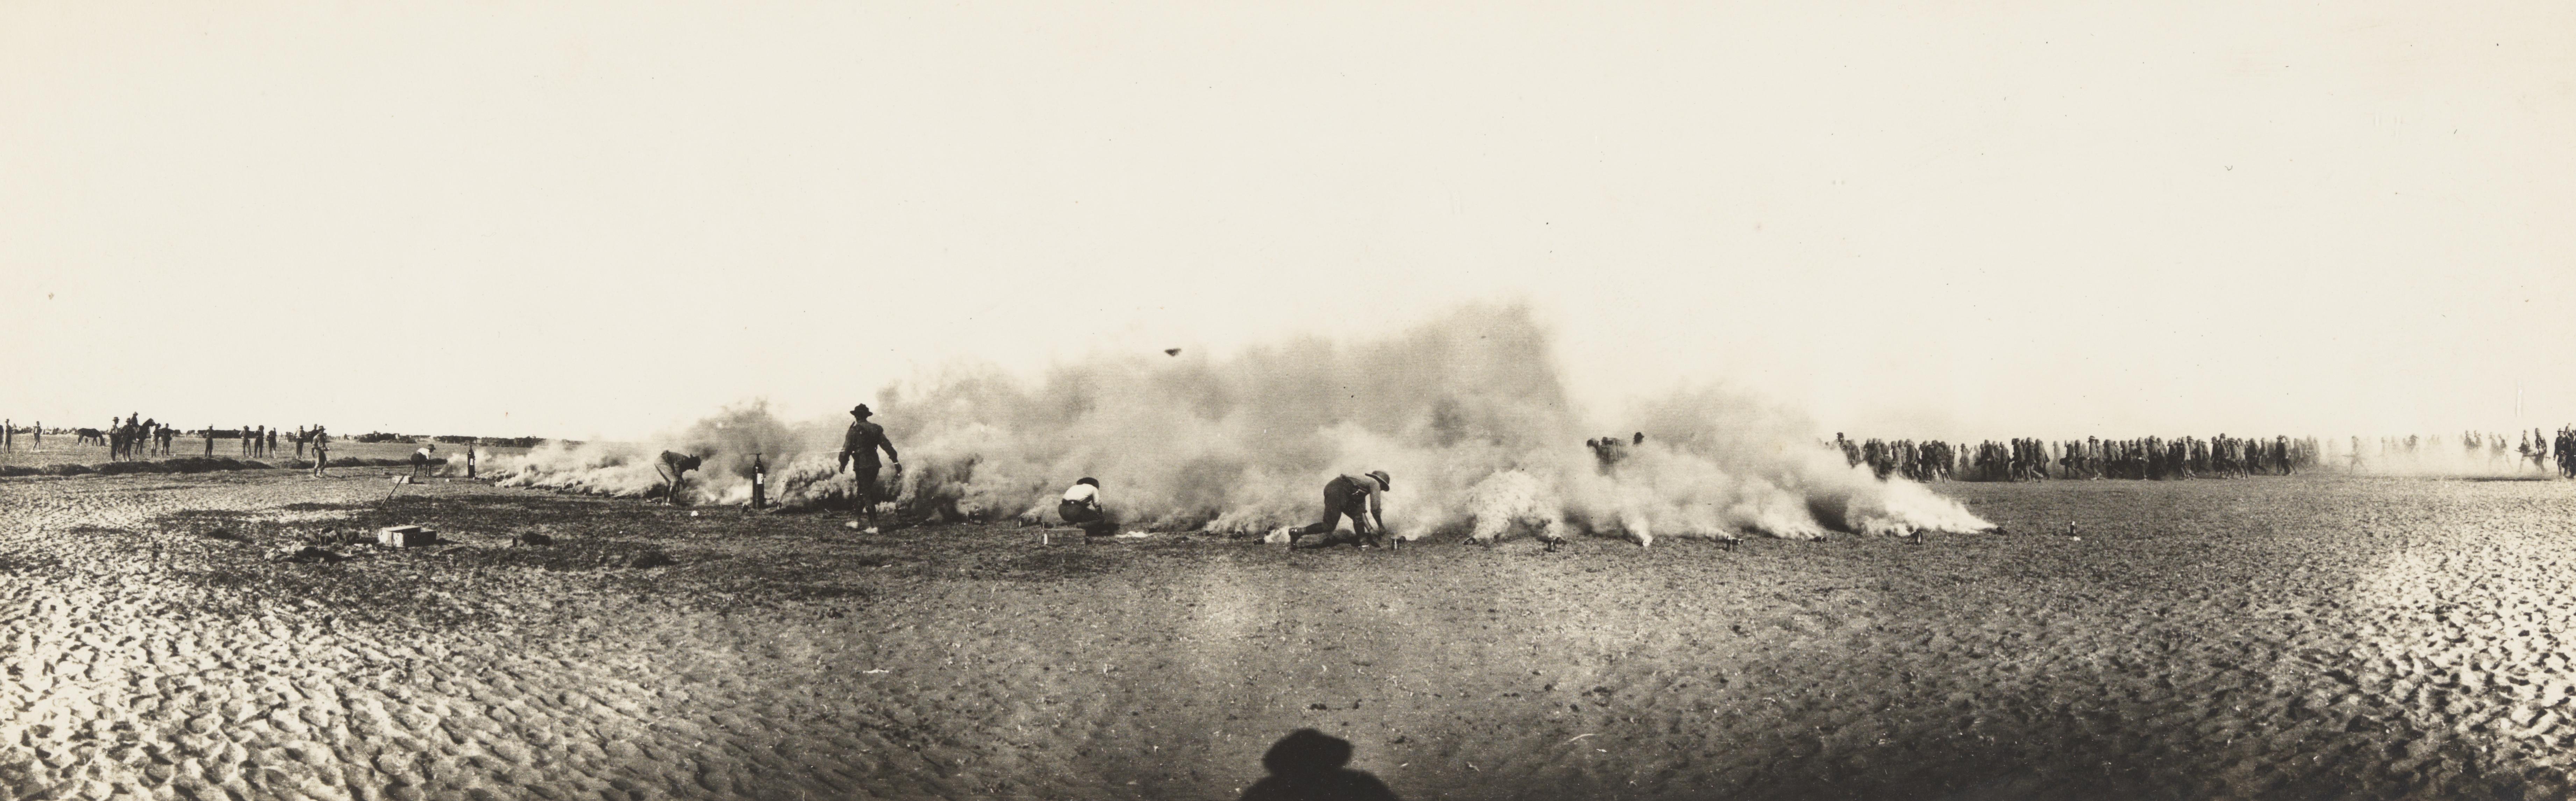 Smoke bombs demonstration, Australian troops, attrib. Palestine, ca. 1916-1917, James Allan Chauvel